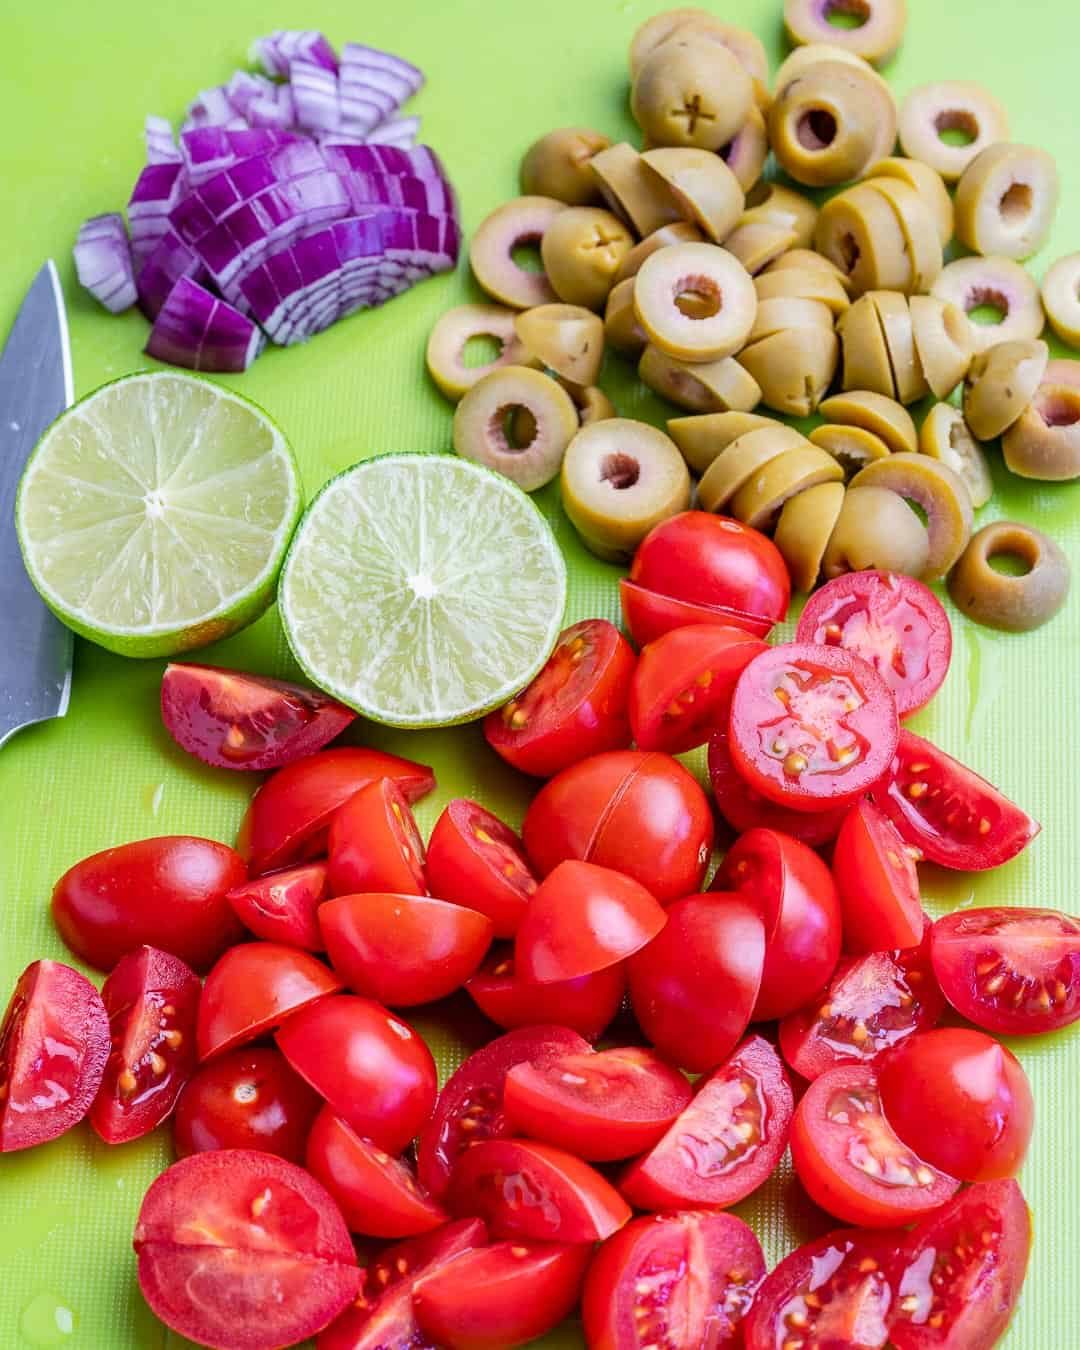 southwest pasta salad ingredients